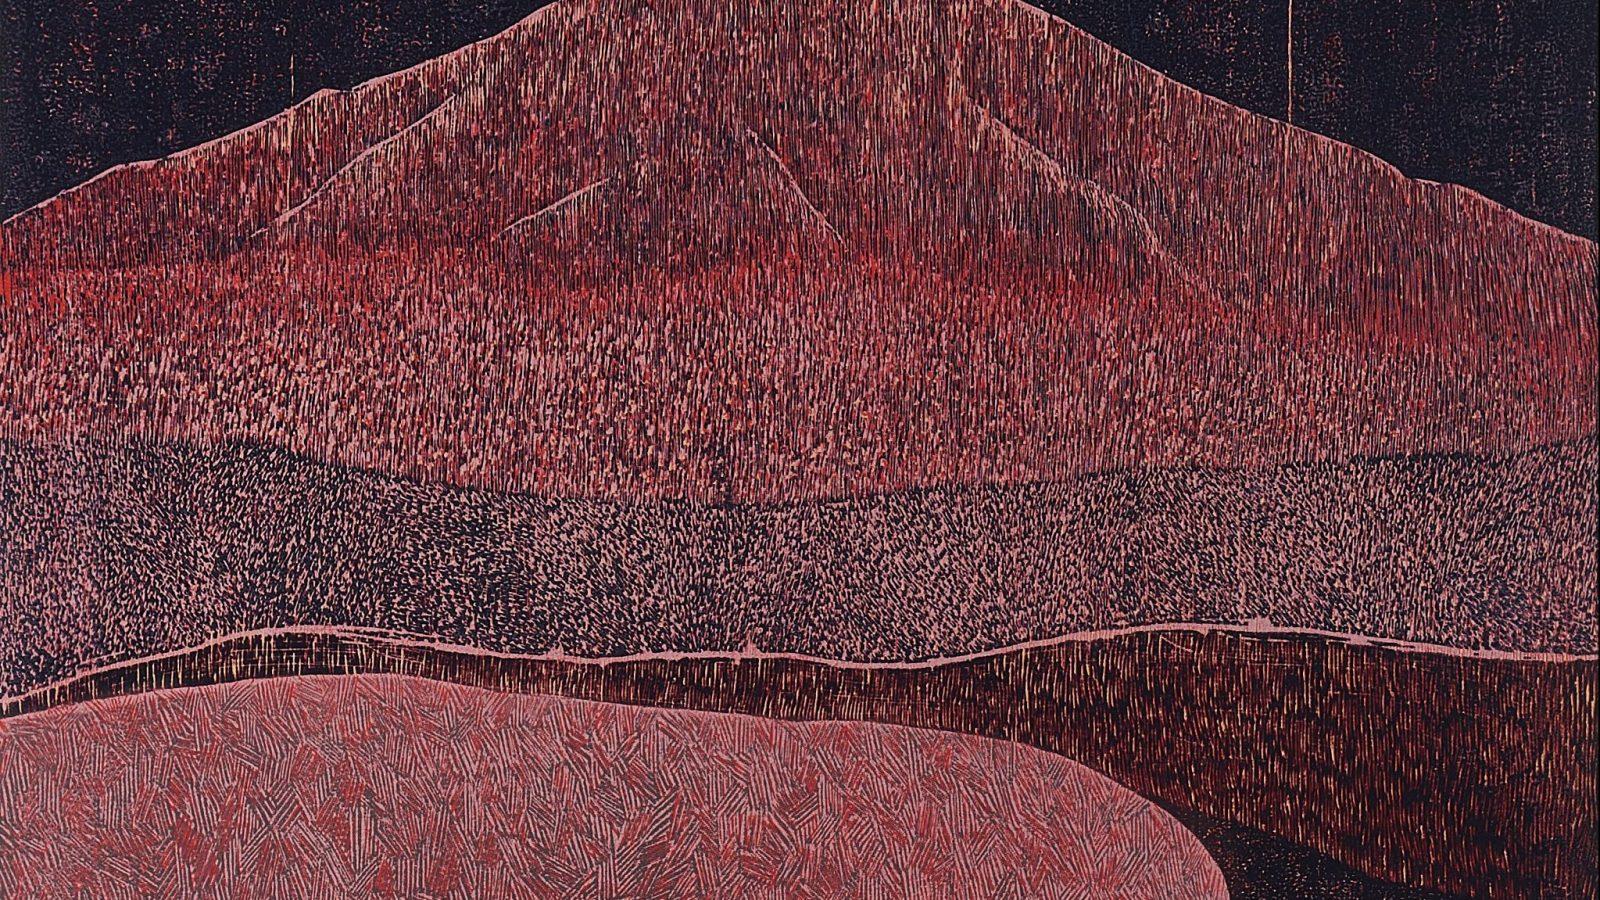 Soghra Khurasani. Skin I, 2018. Woodcut print on paper. Image courtesy of TARQ